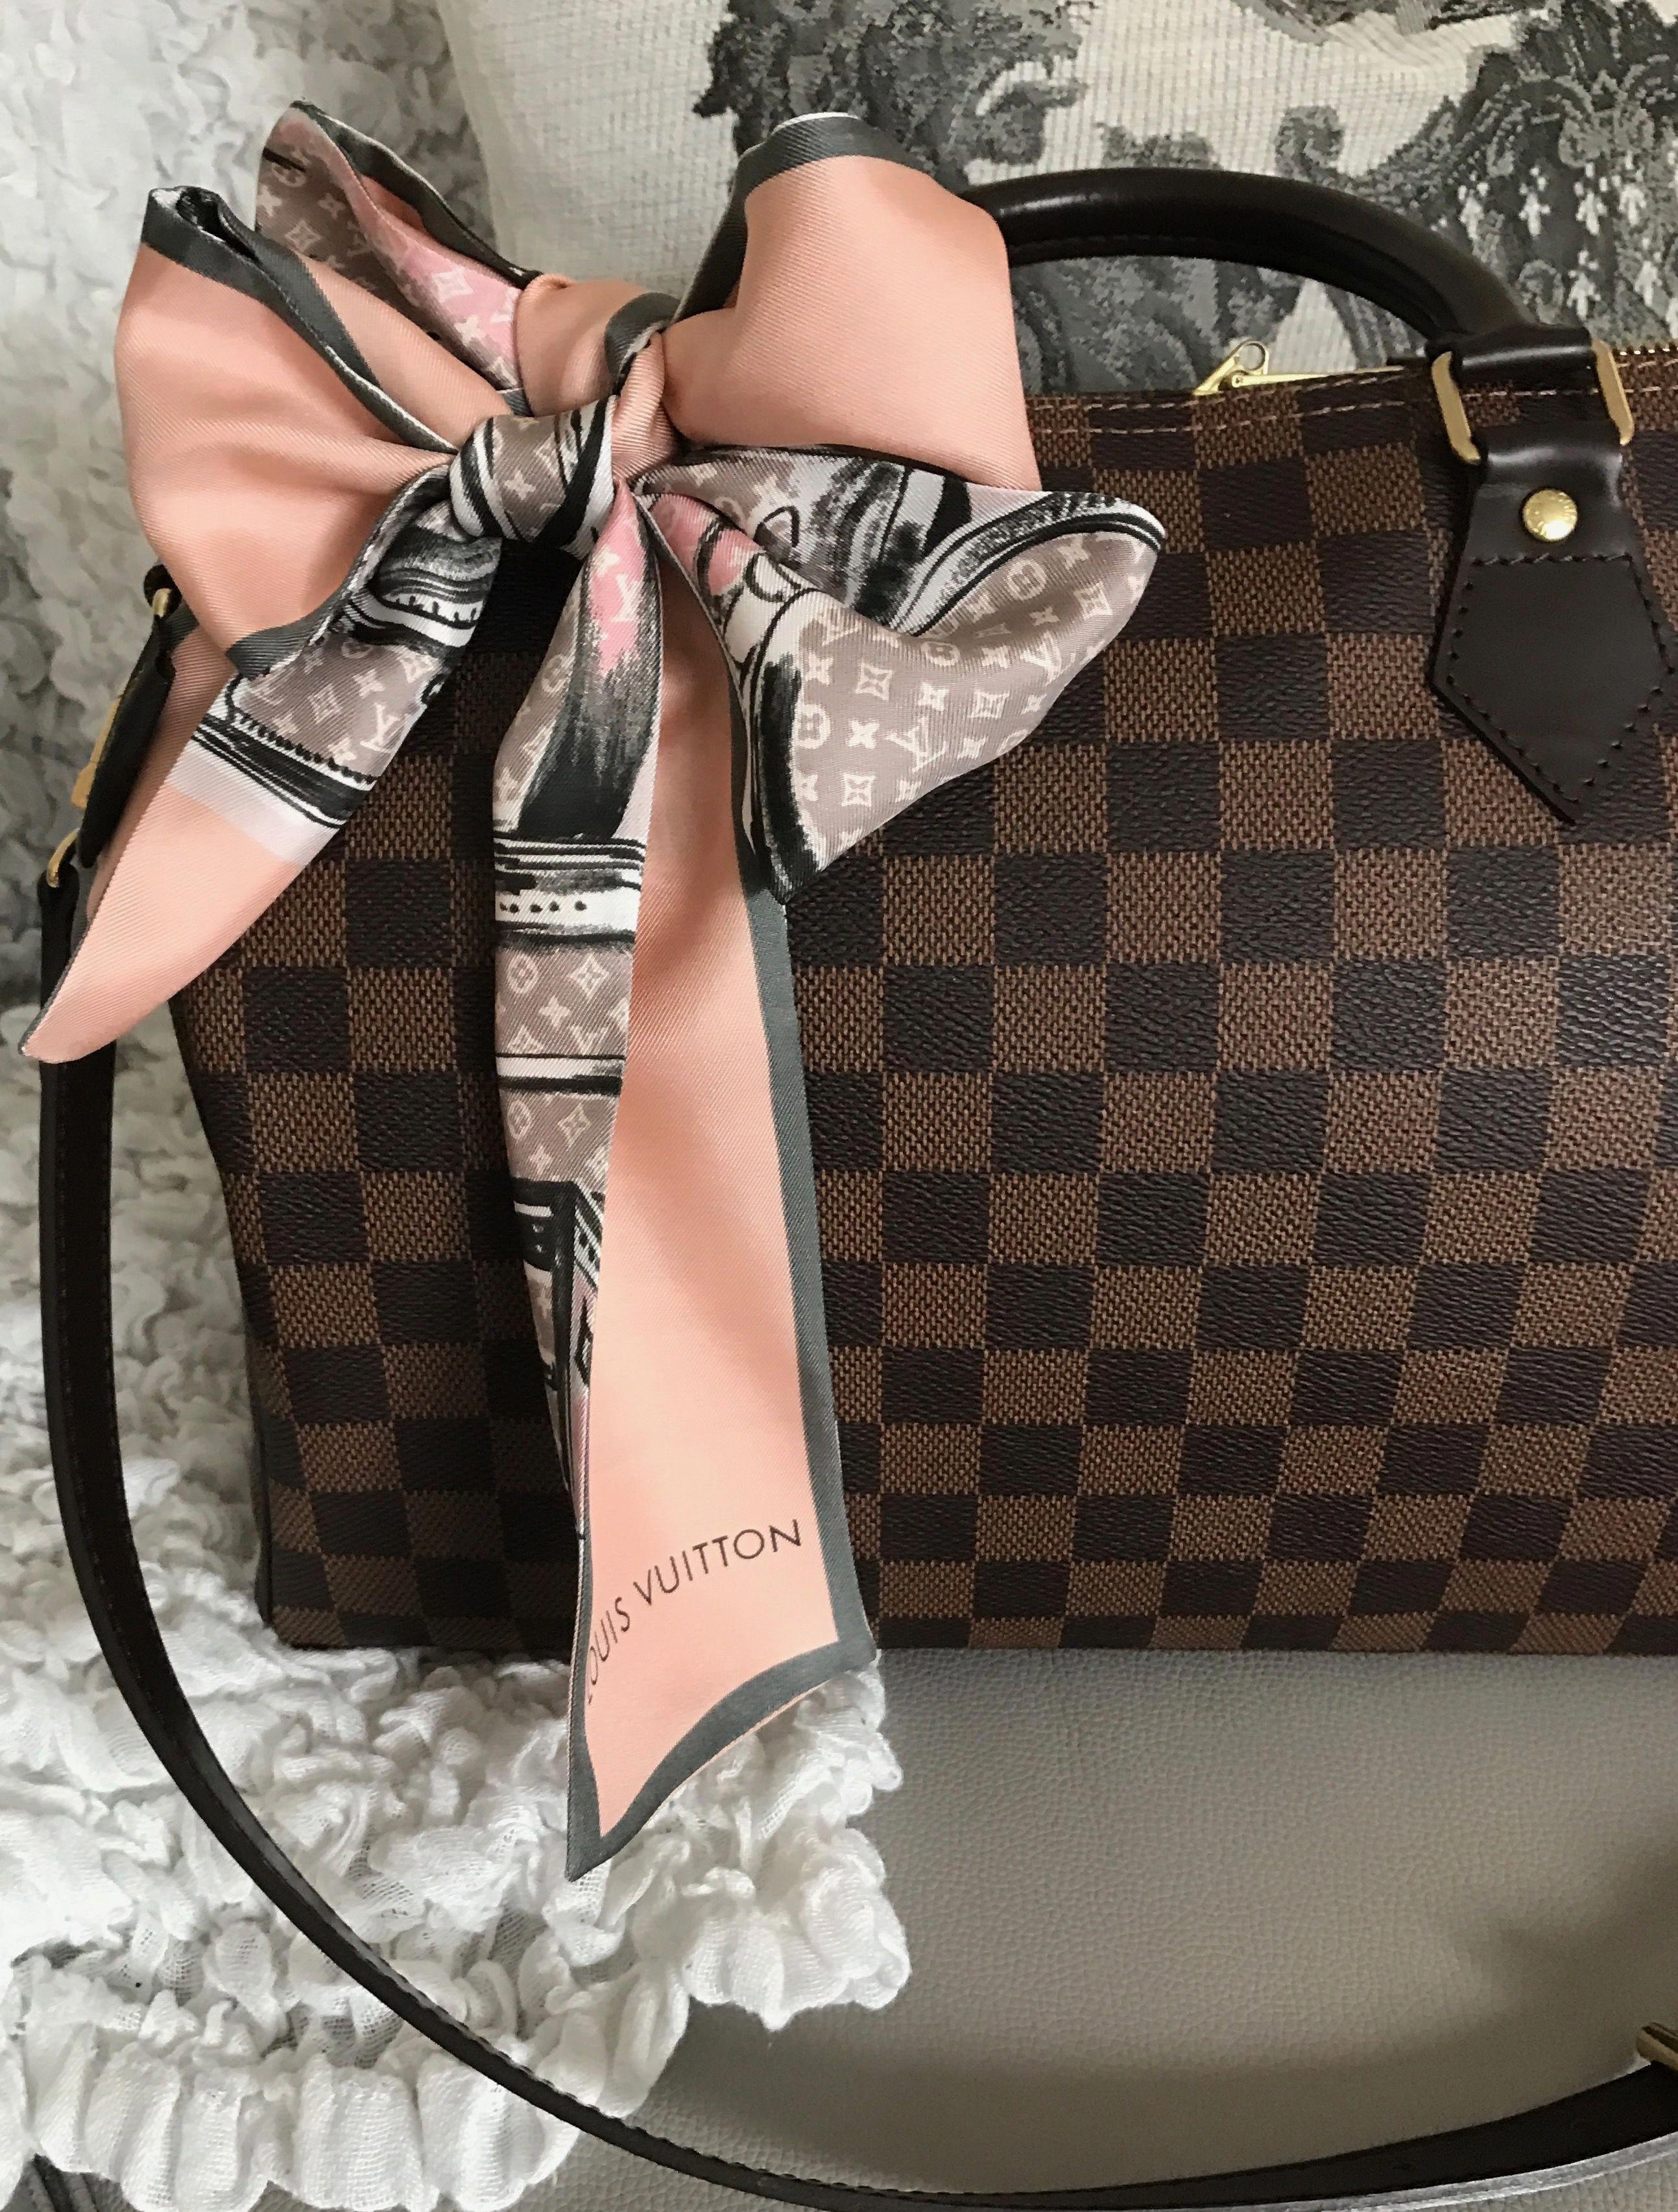 fea254bd9bb2 Louis Vuitton speedy B 30 Damier ebene with lv bandeau  Louisvuittonhandbags